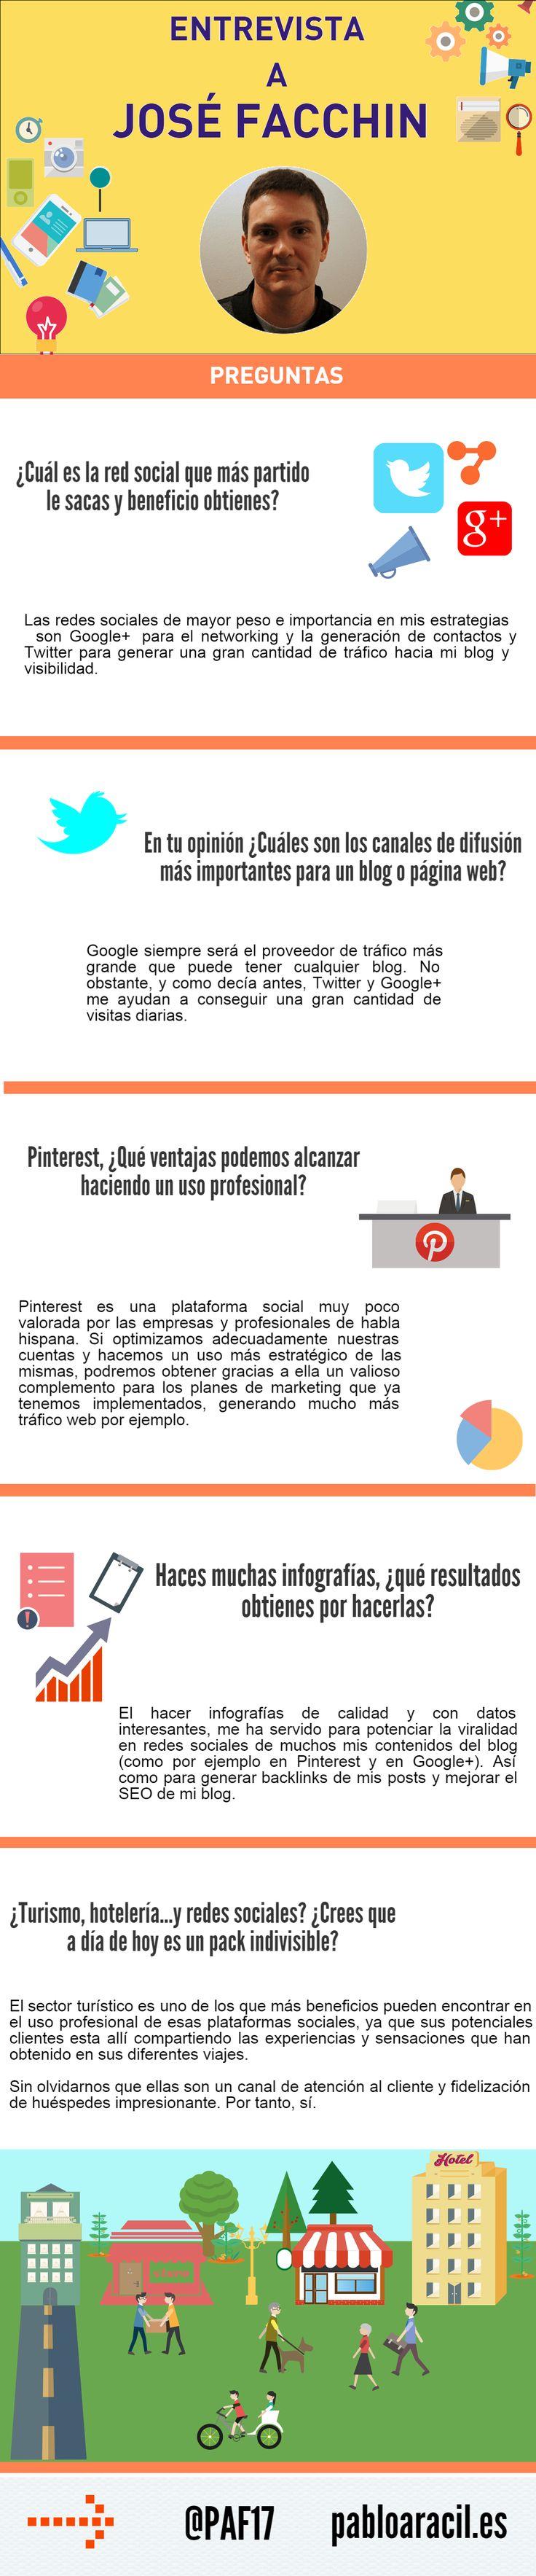 #Infografia a modo de resumen de la entrevista a José Facchin sobre #socialMedia #Pinterest y #MarketingOnline